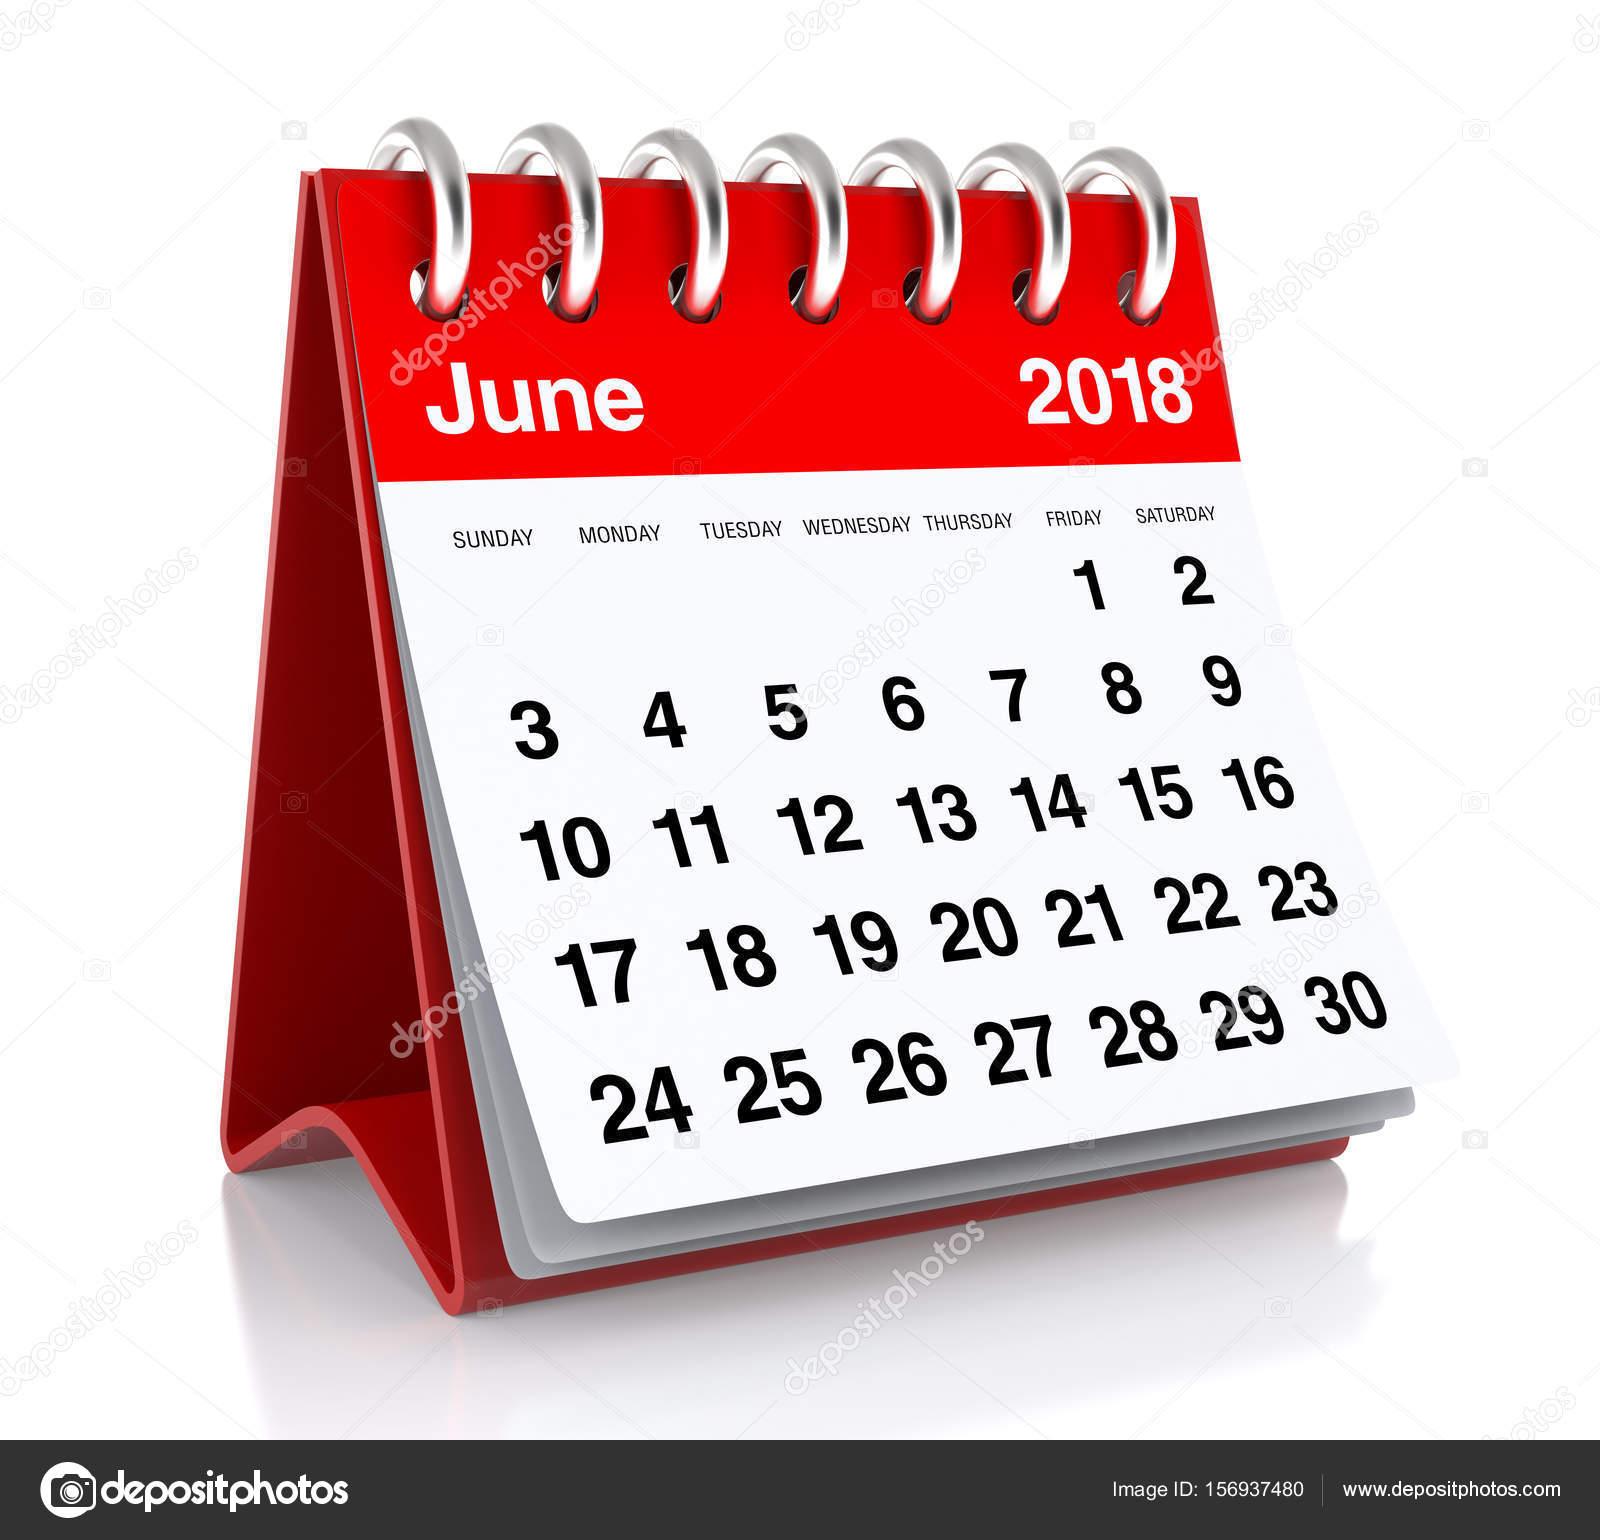 calendrier juin 2018 — Photo #156937480